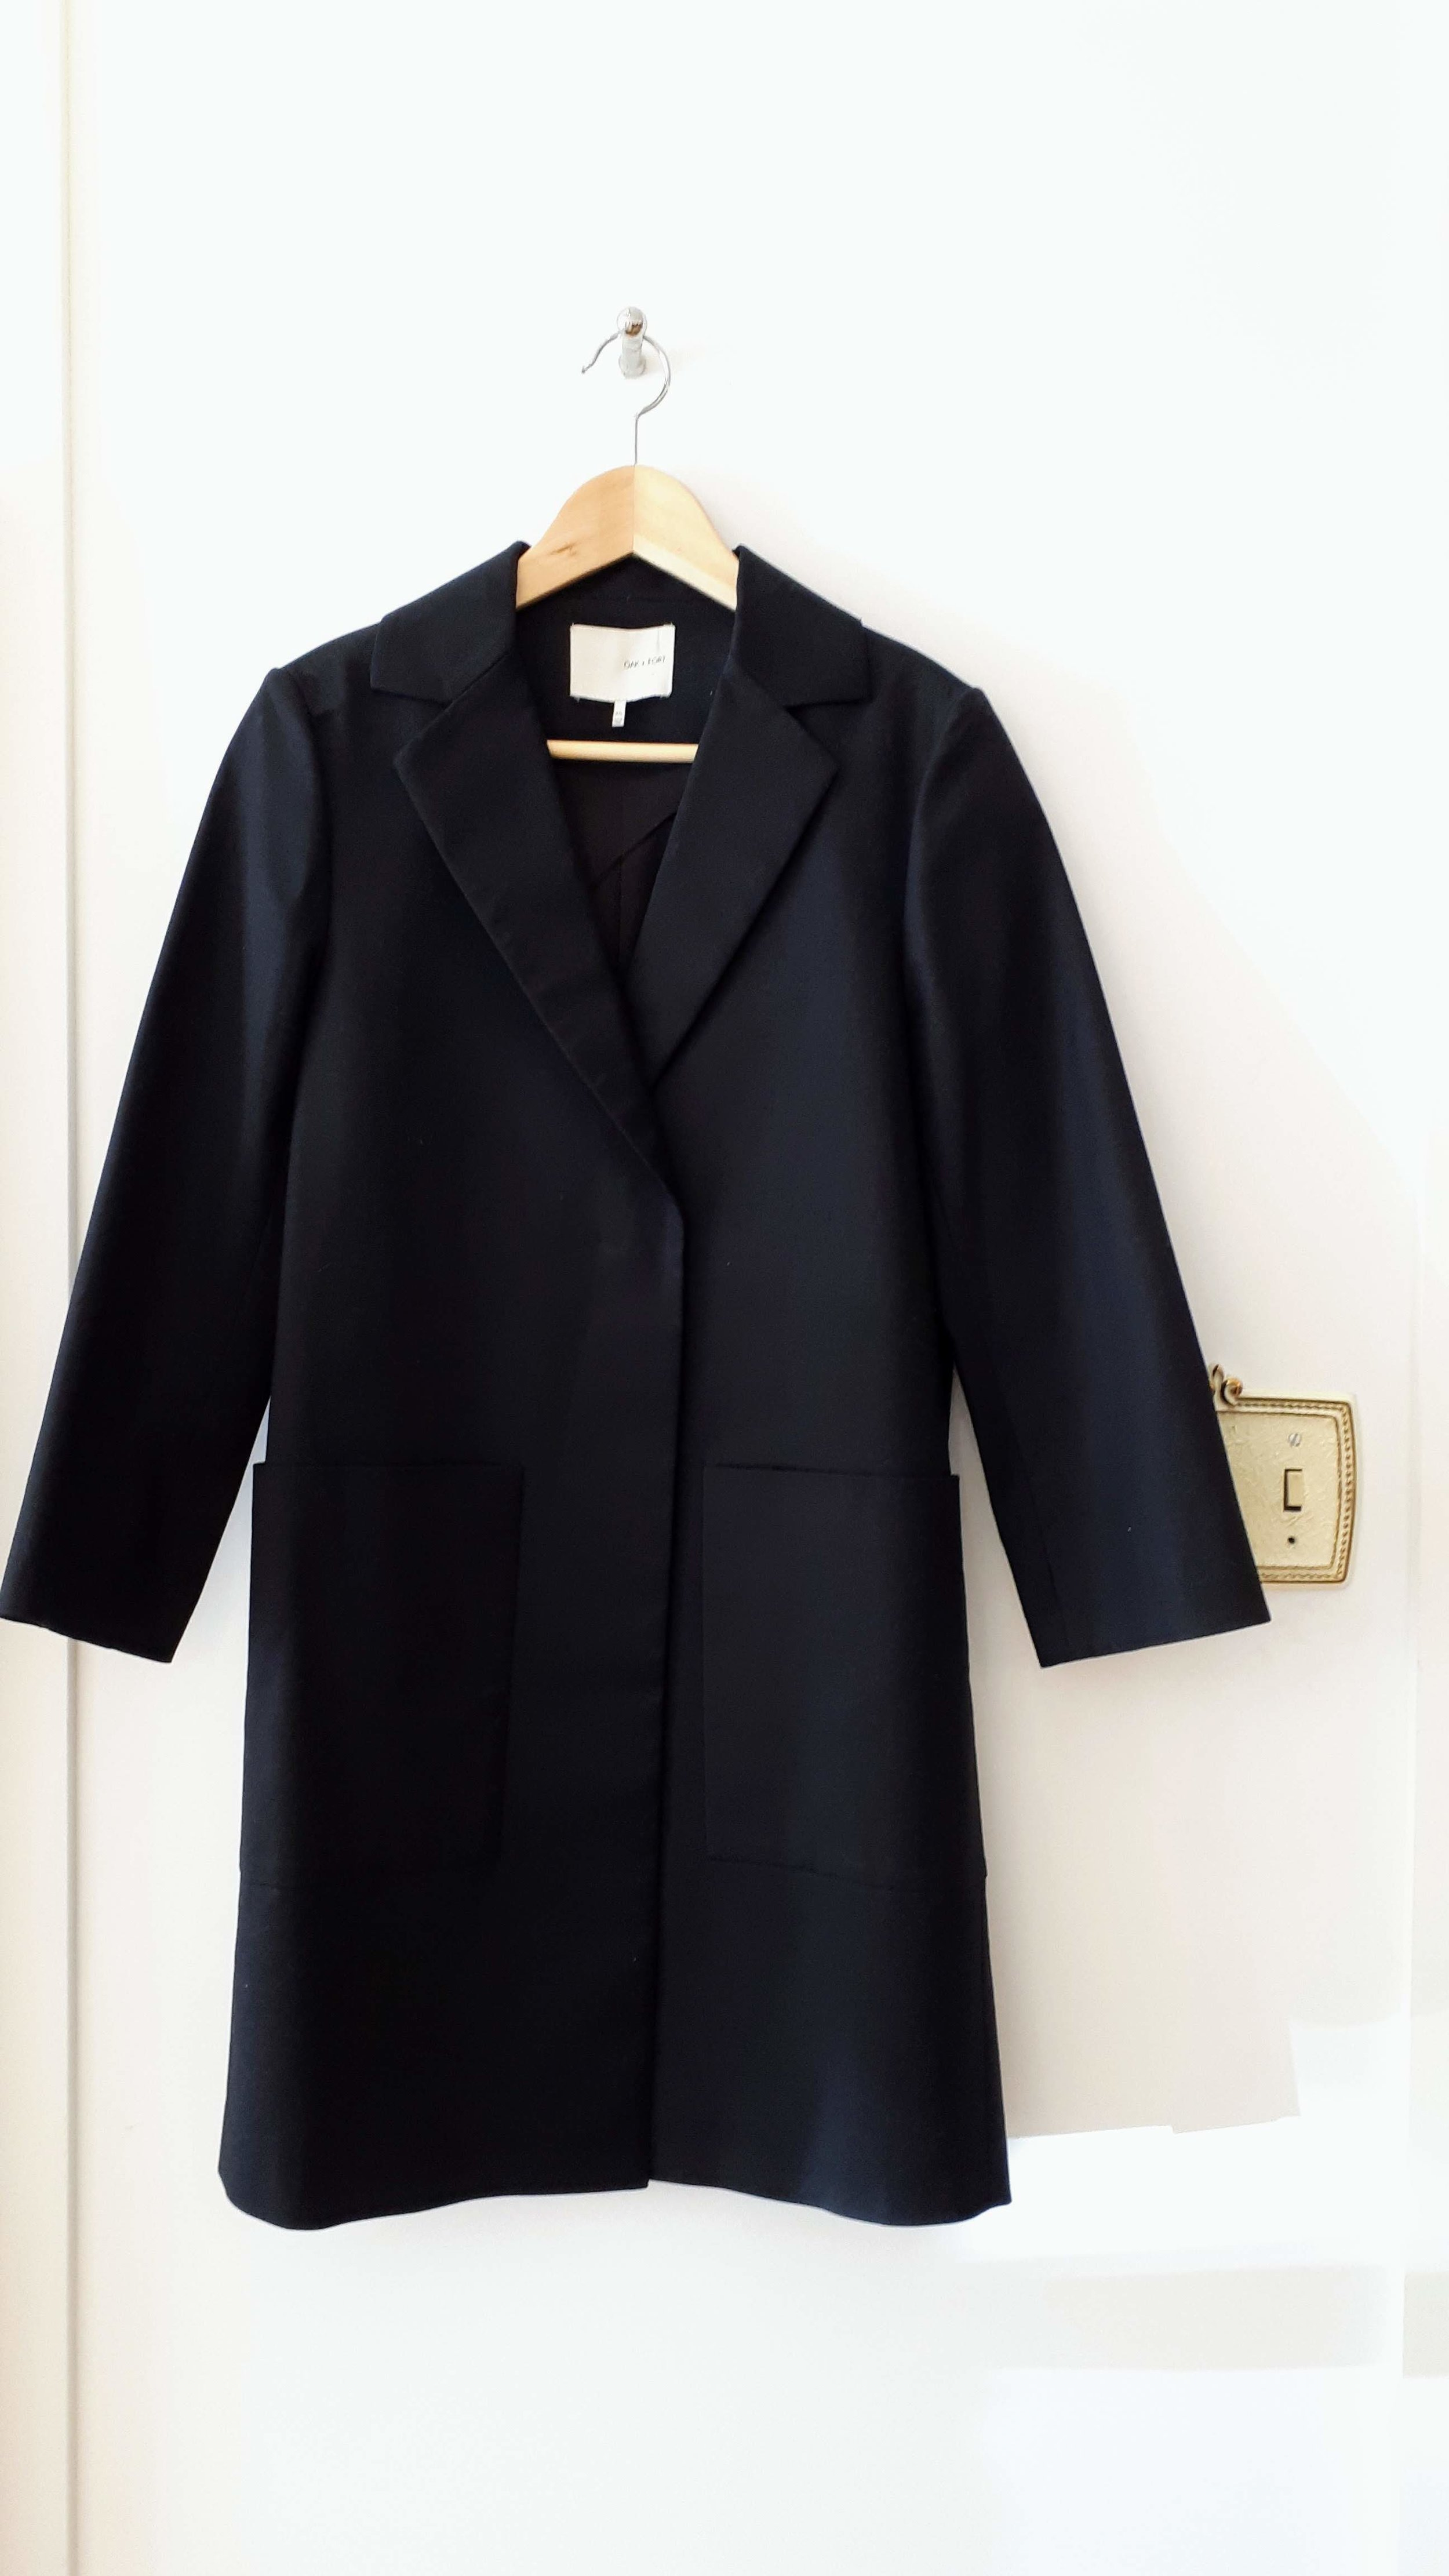 Oak + Fort coat; Size XS, $72